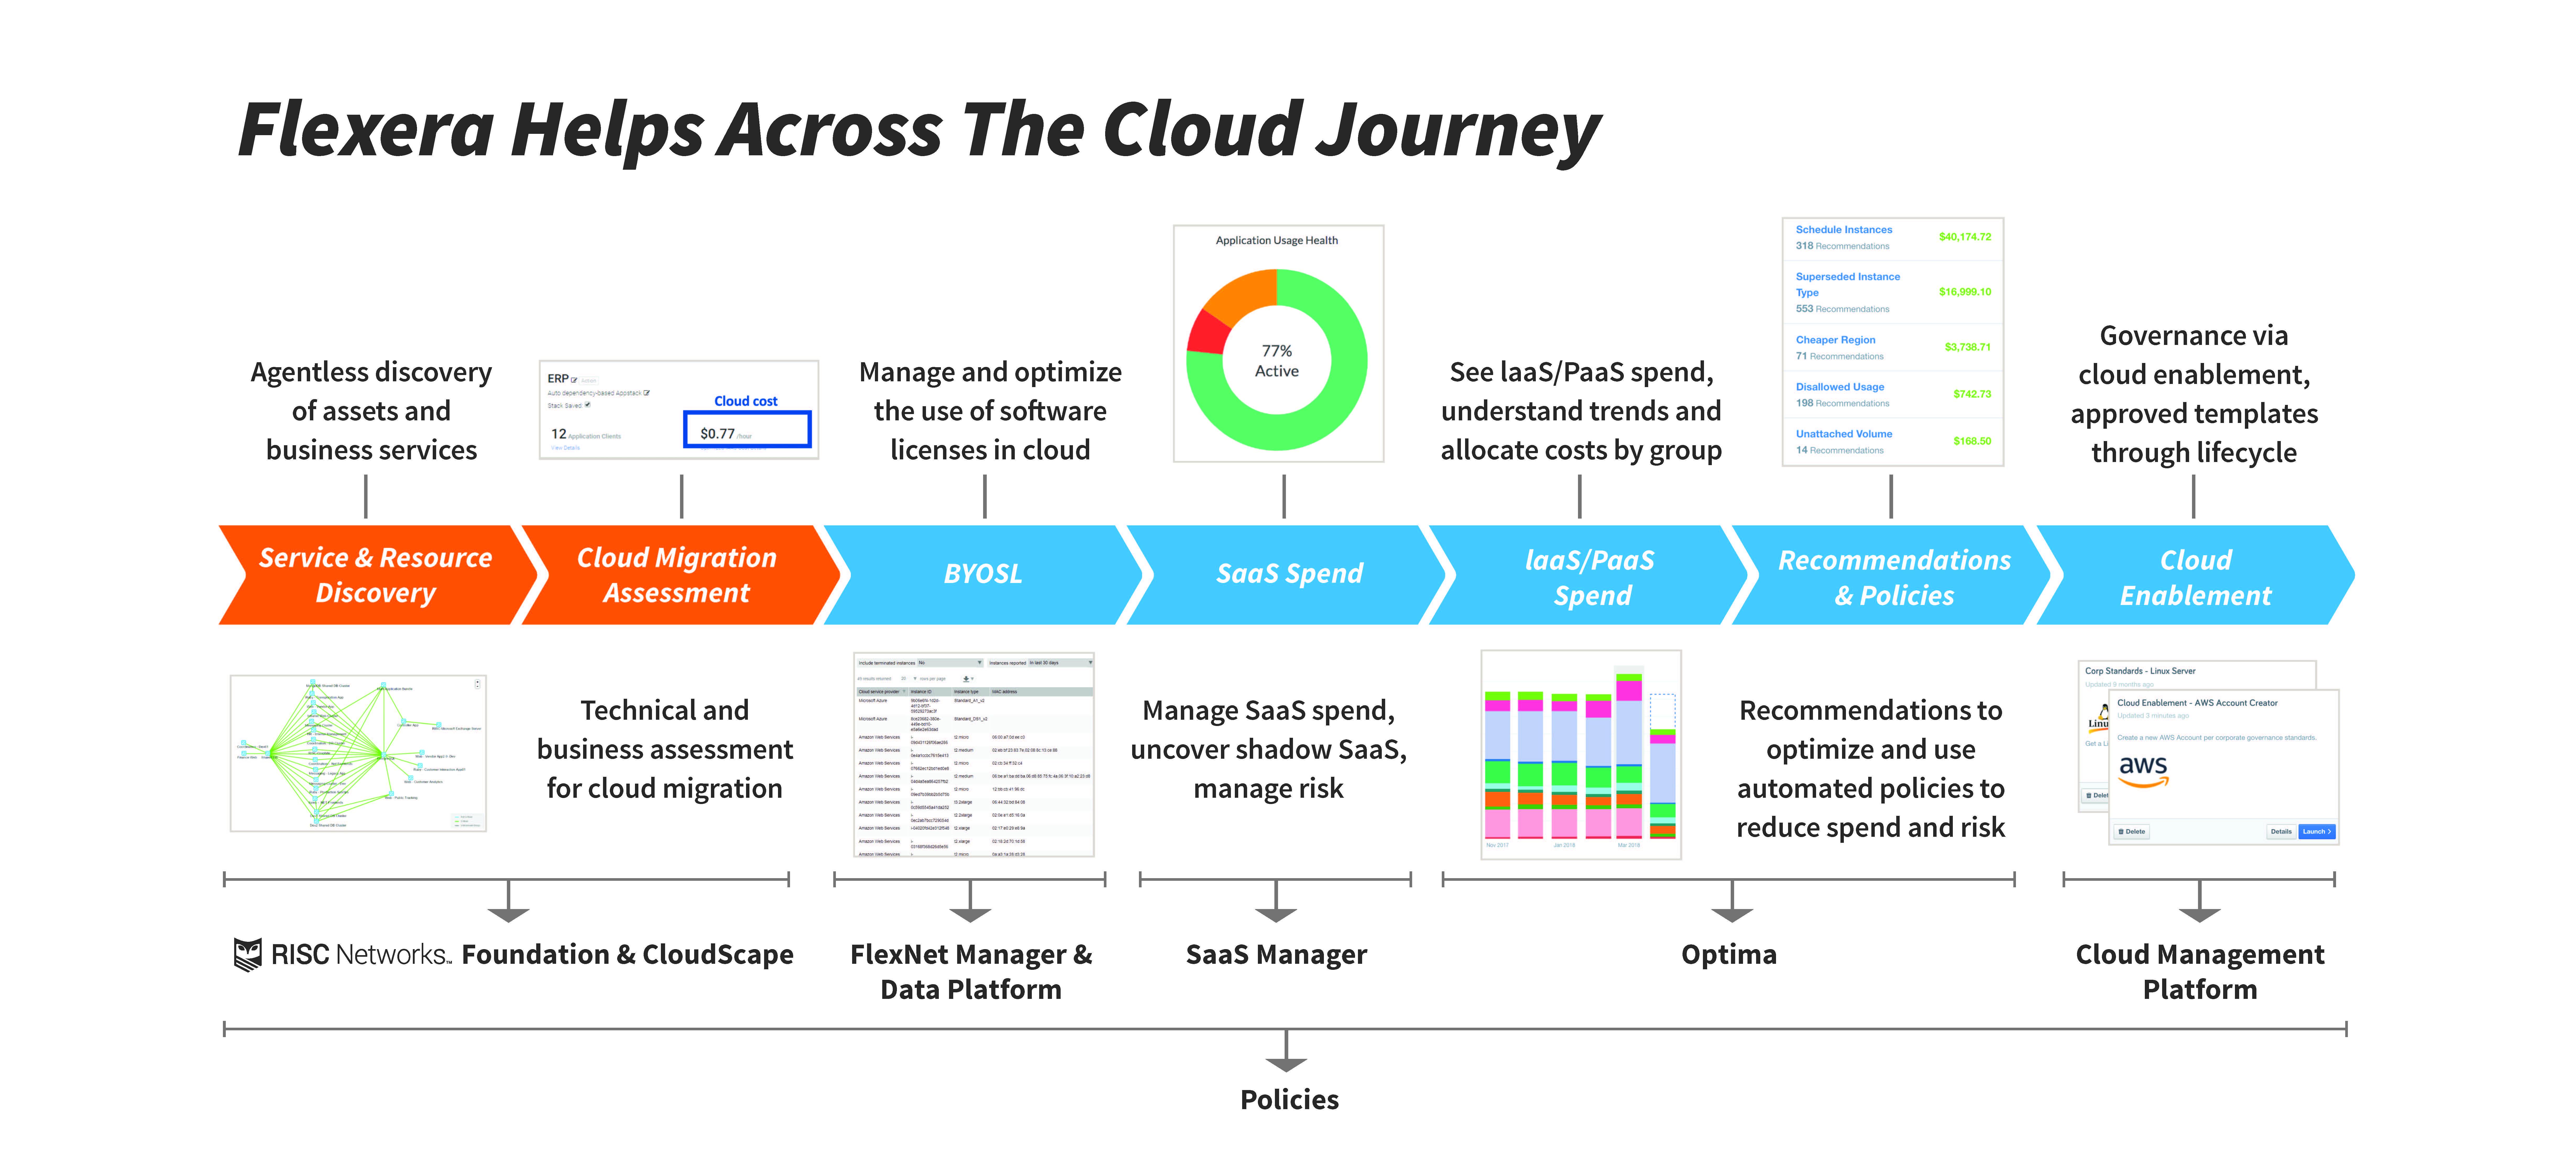 Flexera helps across the cloud journey